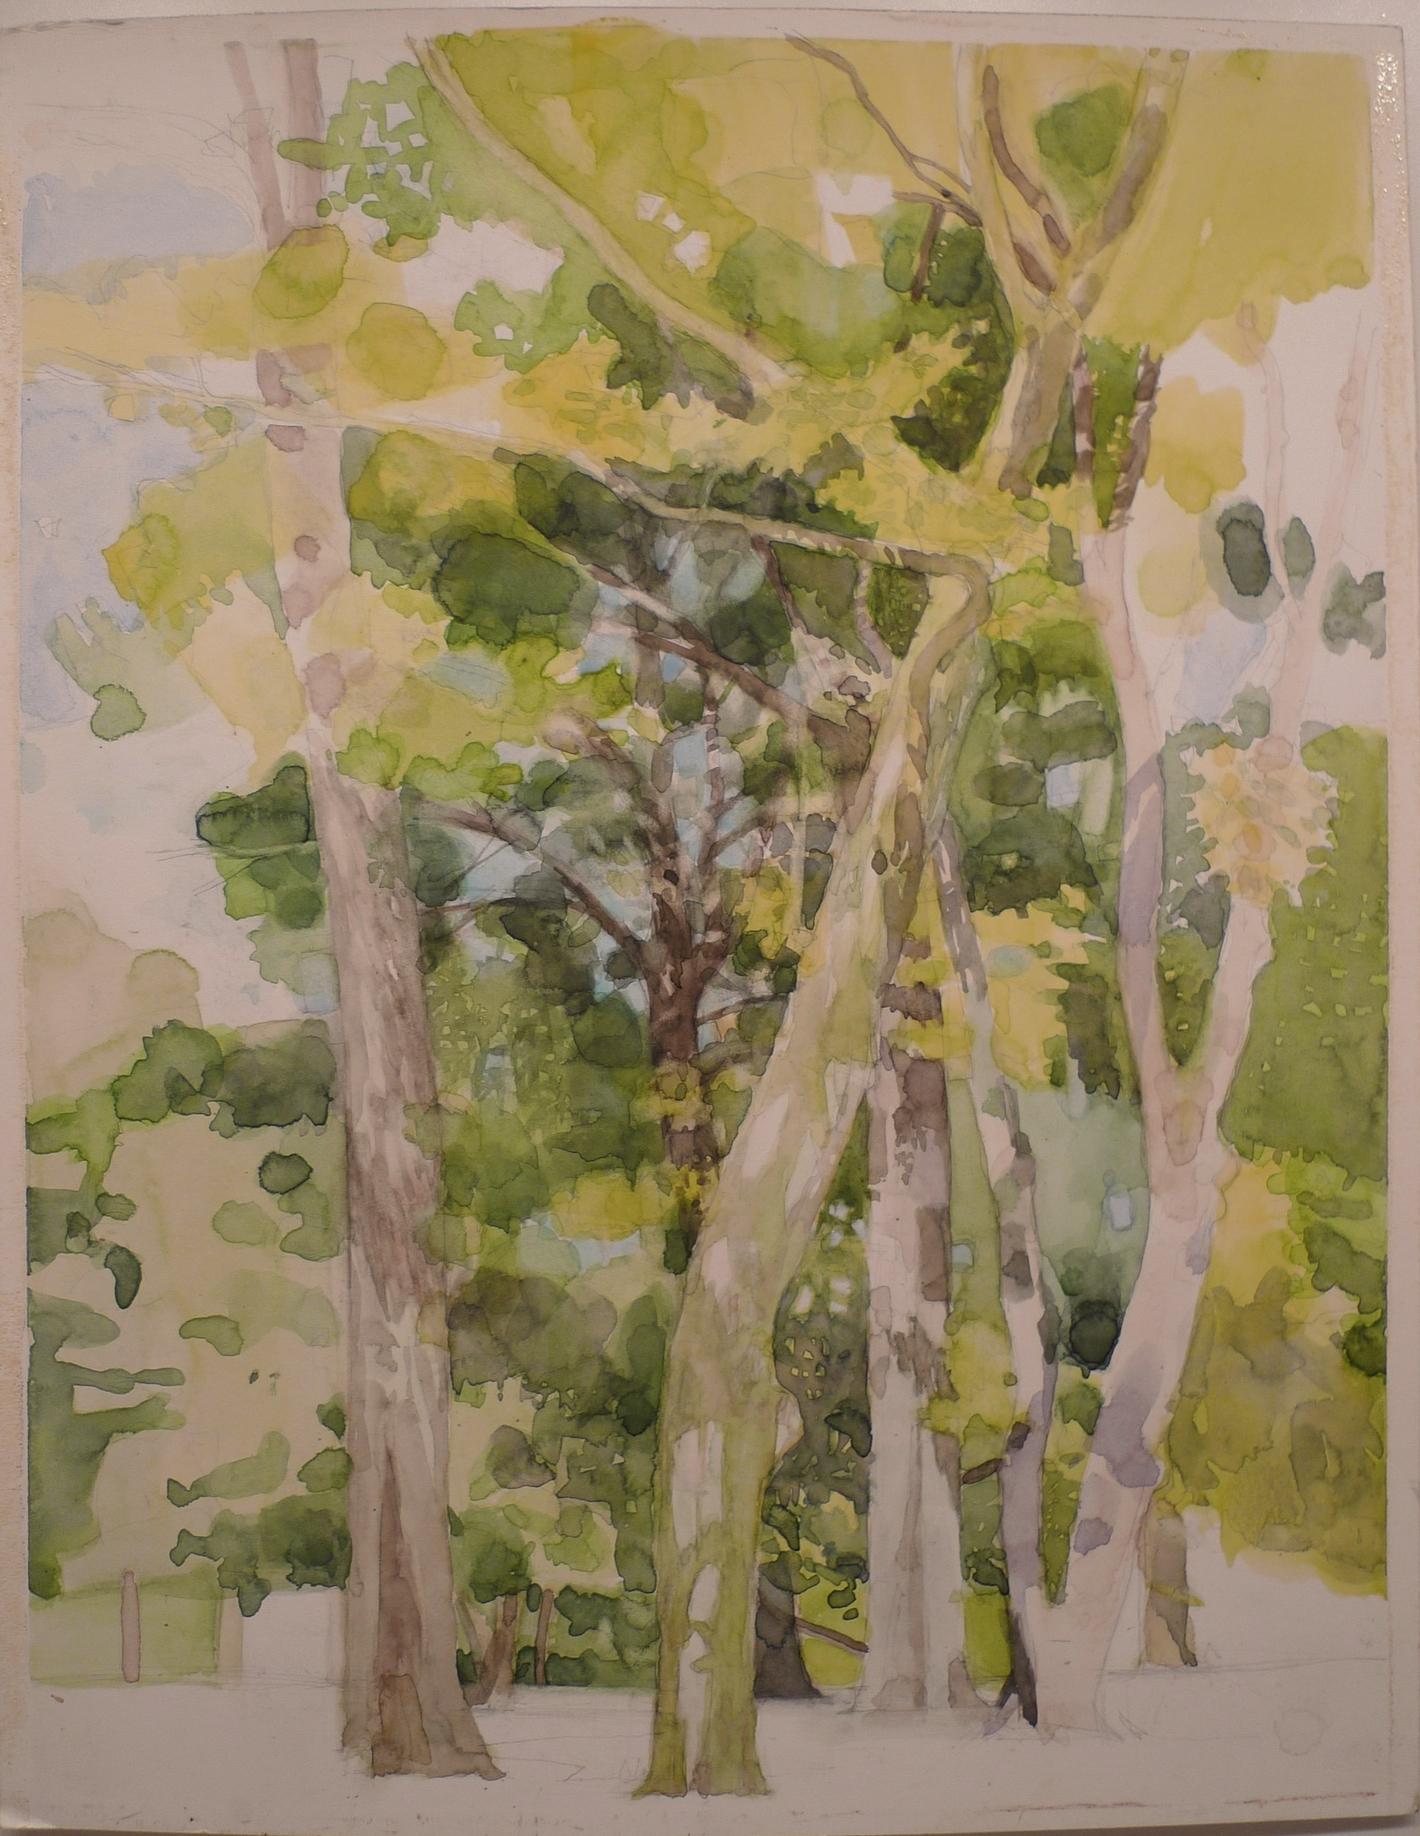 Watercolor on paper 11 x 14 inches Tarek Ashkar,2007